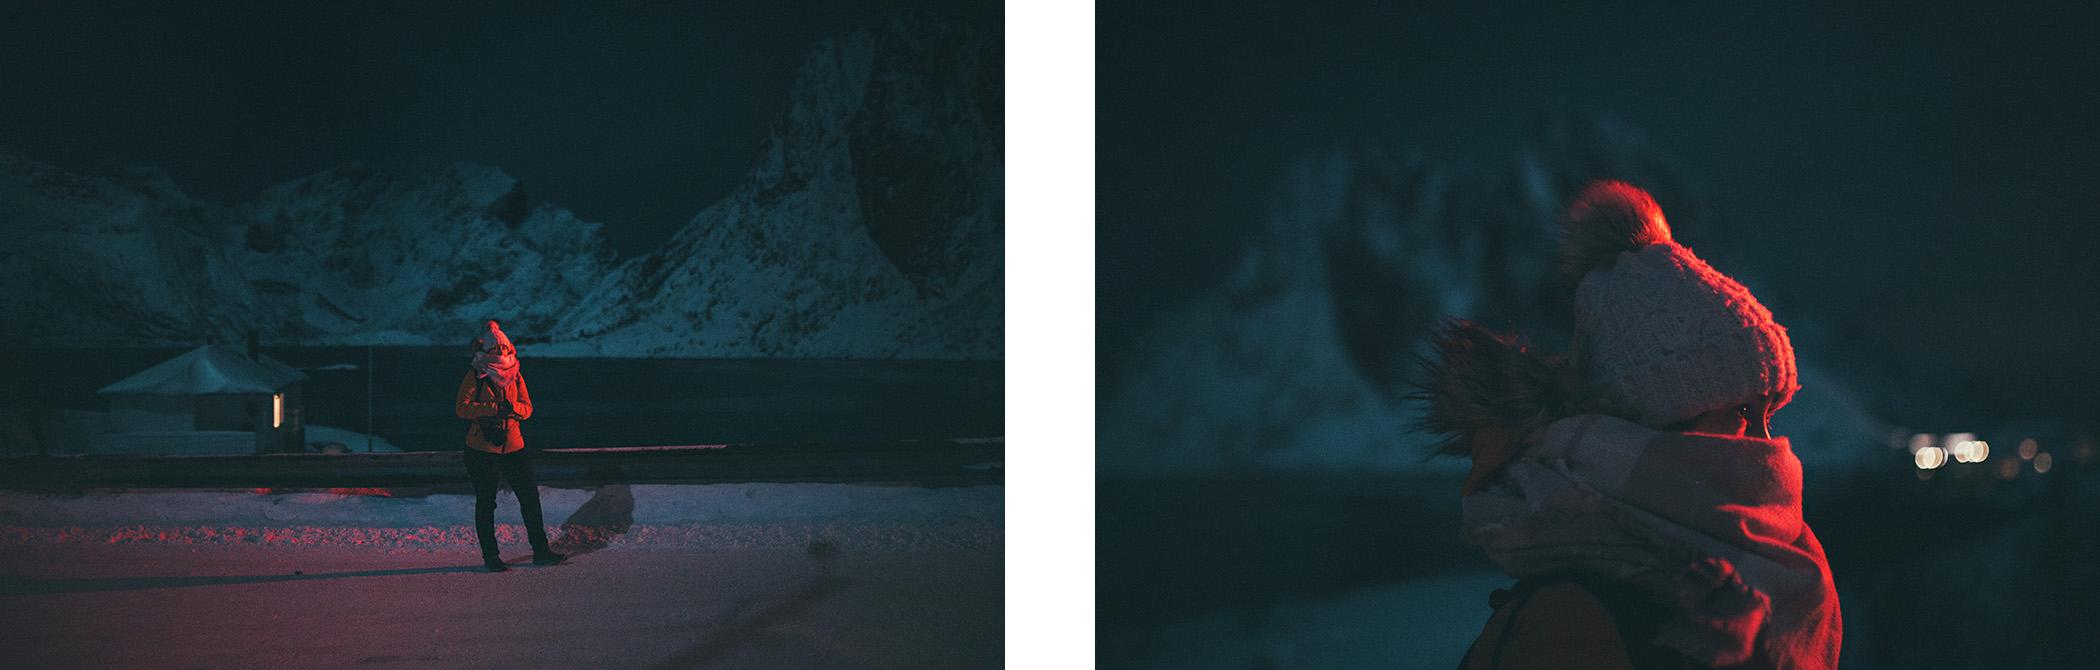 nocne spacery, Lofoty